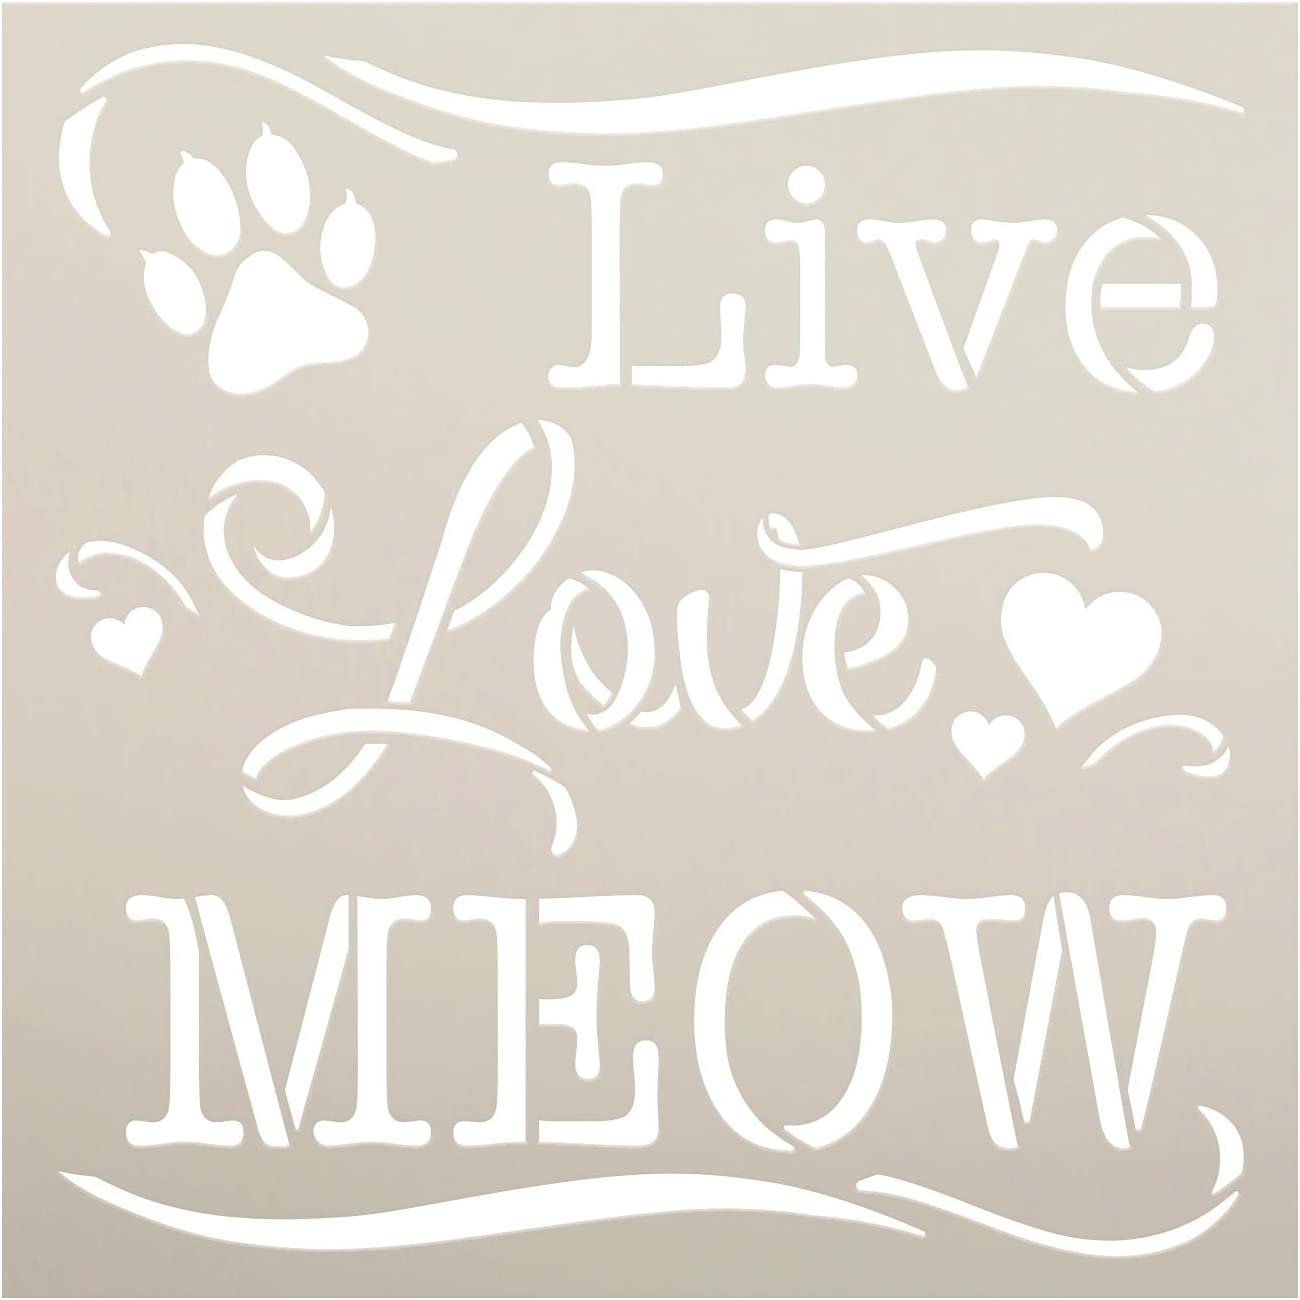 Live Love Meow Stencil by StudioR12 | DIY Pet Cat Lover Home Decor | Craft & Paint Wood Sign | Reusable Mylar Template | Kitten Paw Print Heart Cursive Script | Select Size